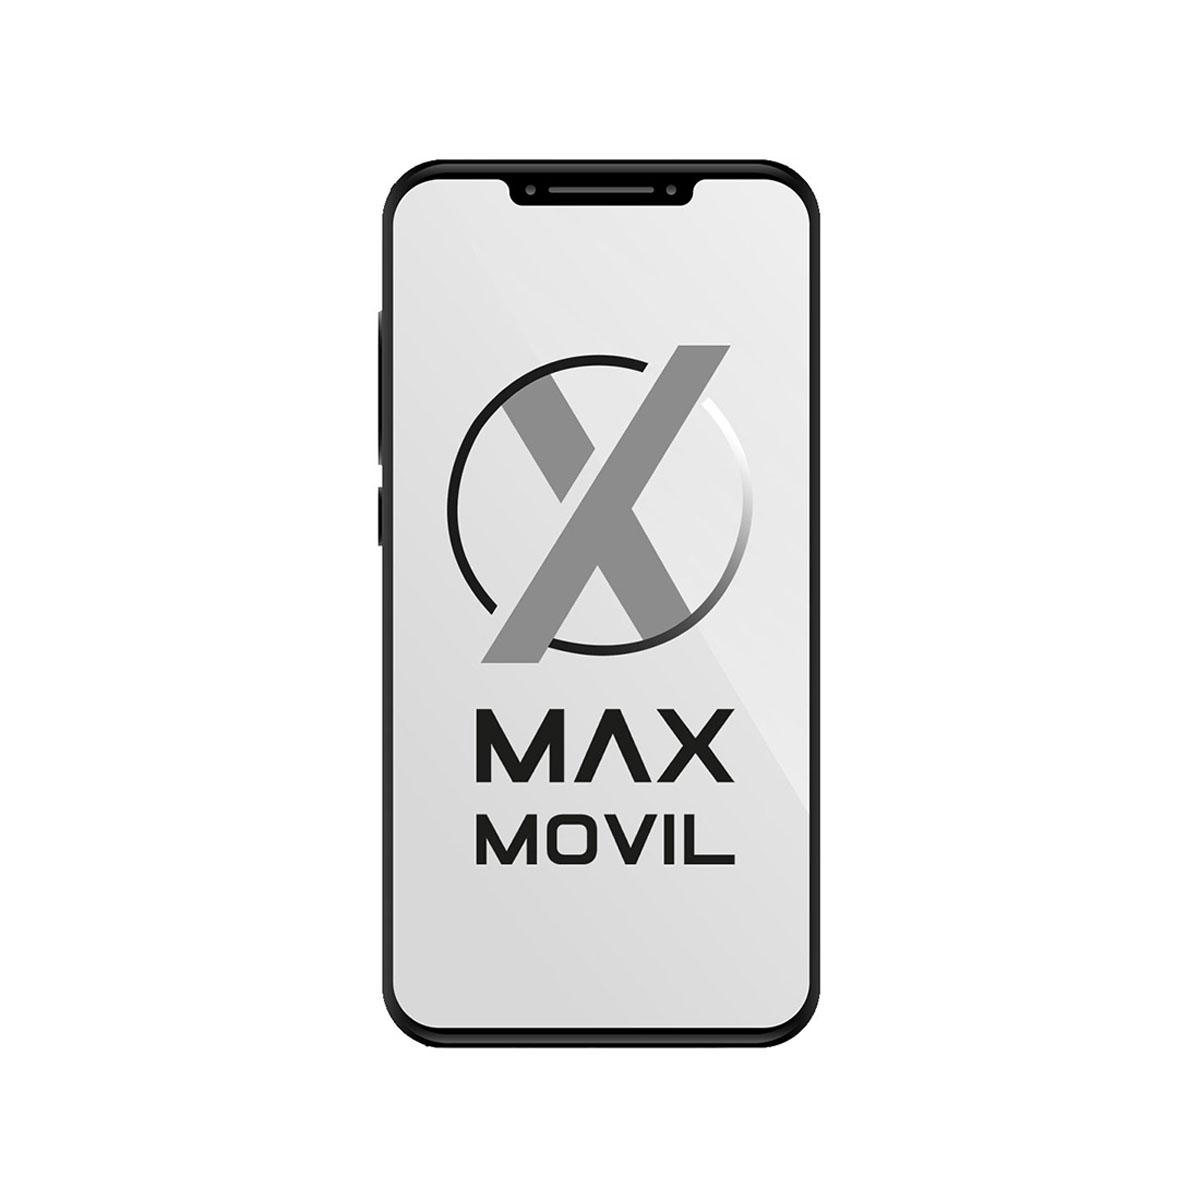 Protector de pantalla ideus para Galaxy S3 mini